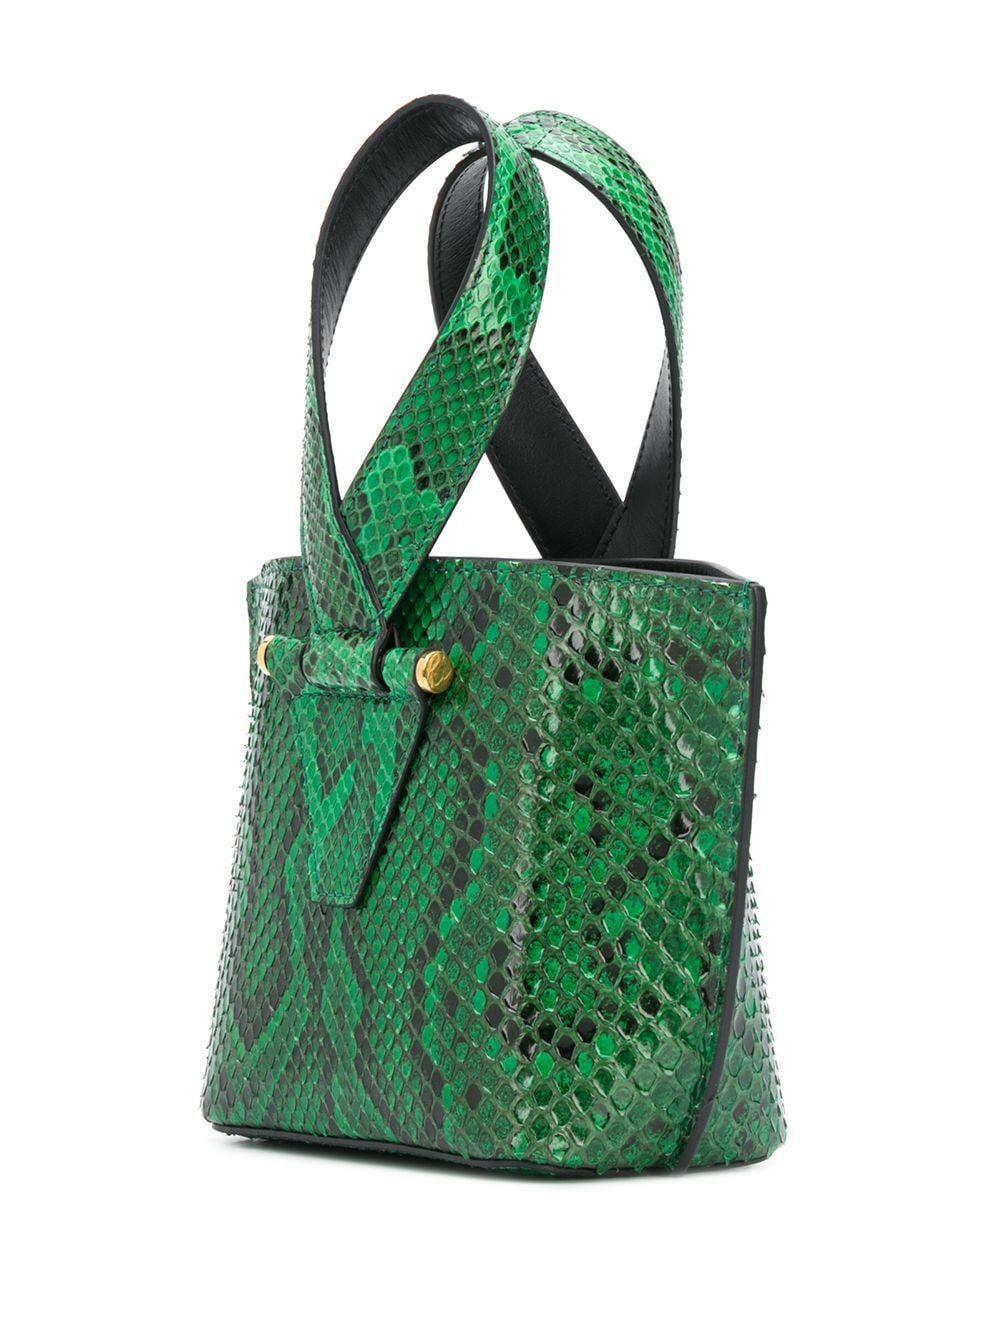 VERSACE WOMEN'S DBFH523D3PMLKVDOT GREEN LEATHER HANDBAG